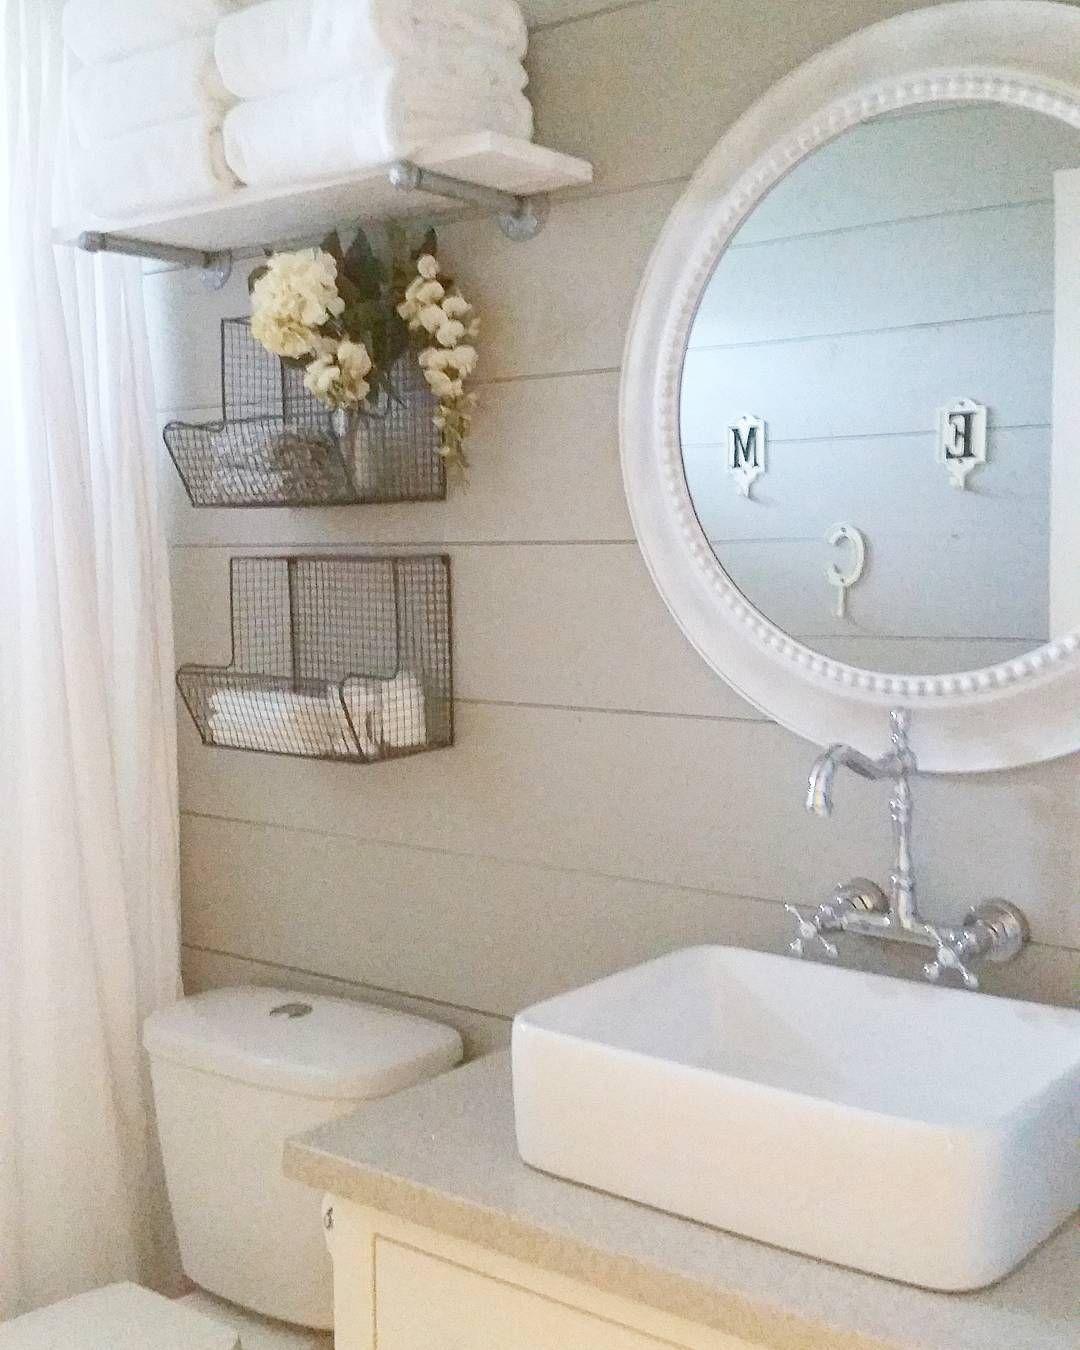 Shiplap Bathroom Vanity: Farmhouse Bathroom Remodel, DIY, Shiplap... Before And